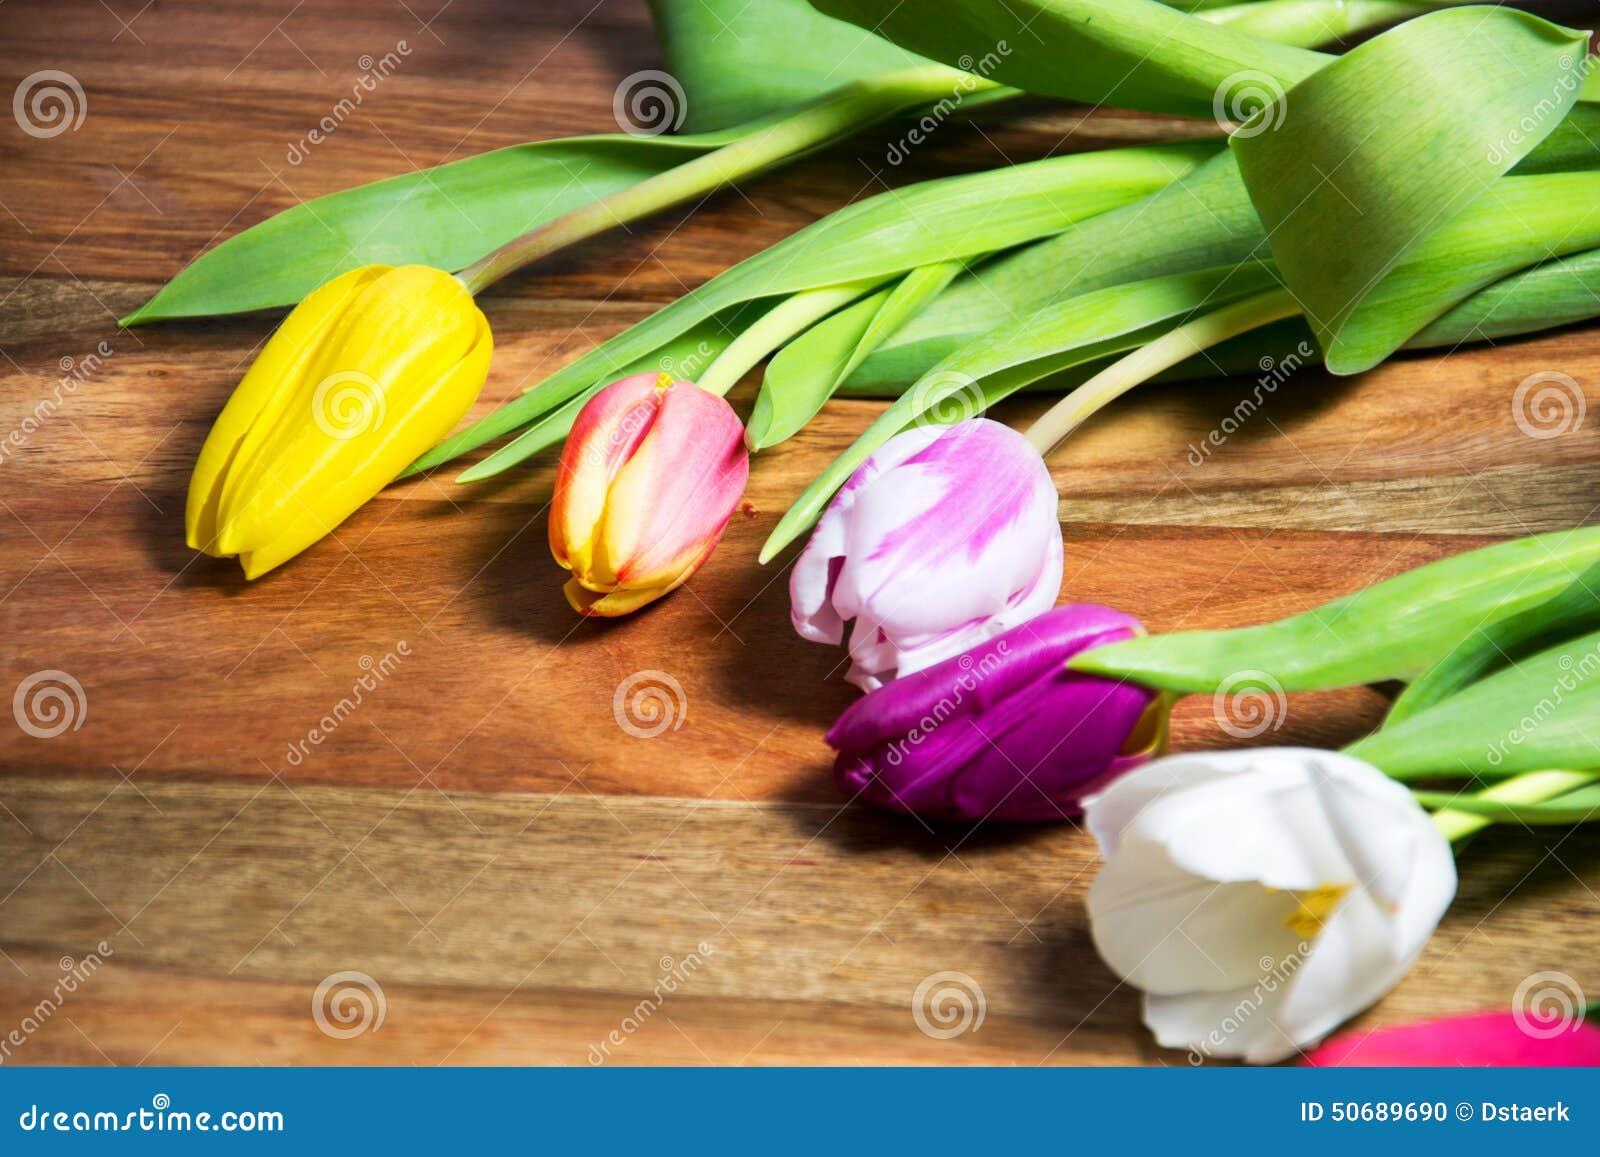 Download 郁金香 库存照片. 图片 包括有 季节性, 开花, 生日, 木头, 花卉, beauvoir, 季节, 春天 - 50689690